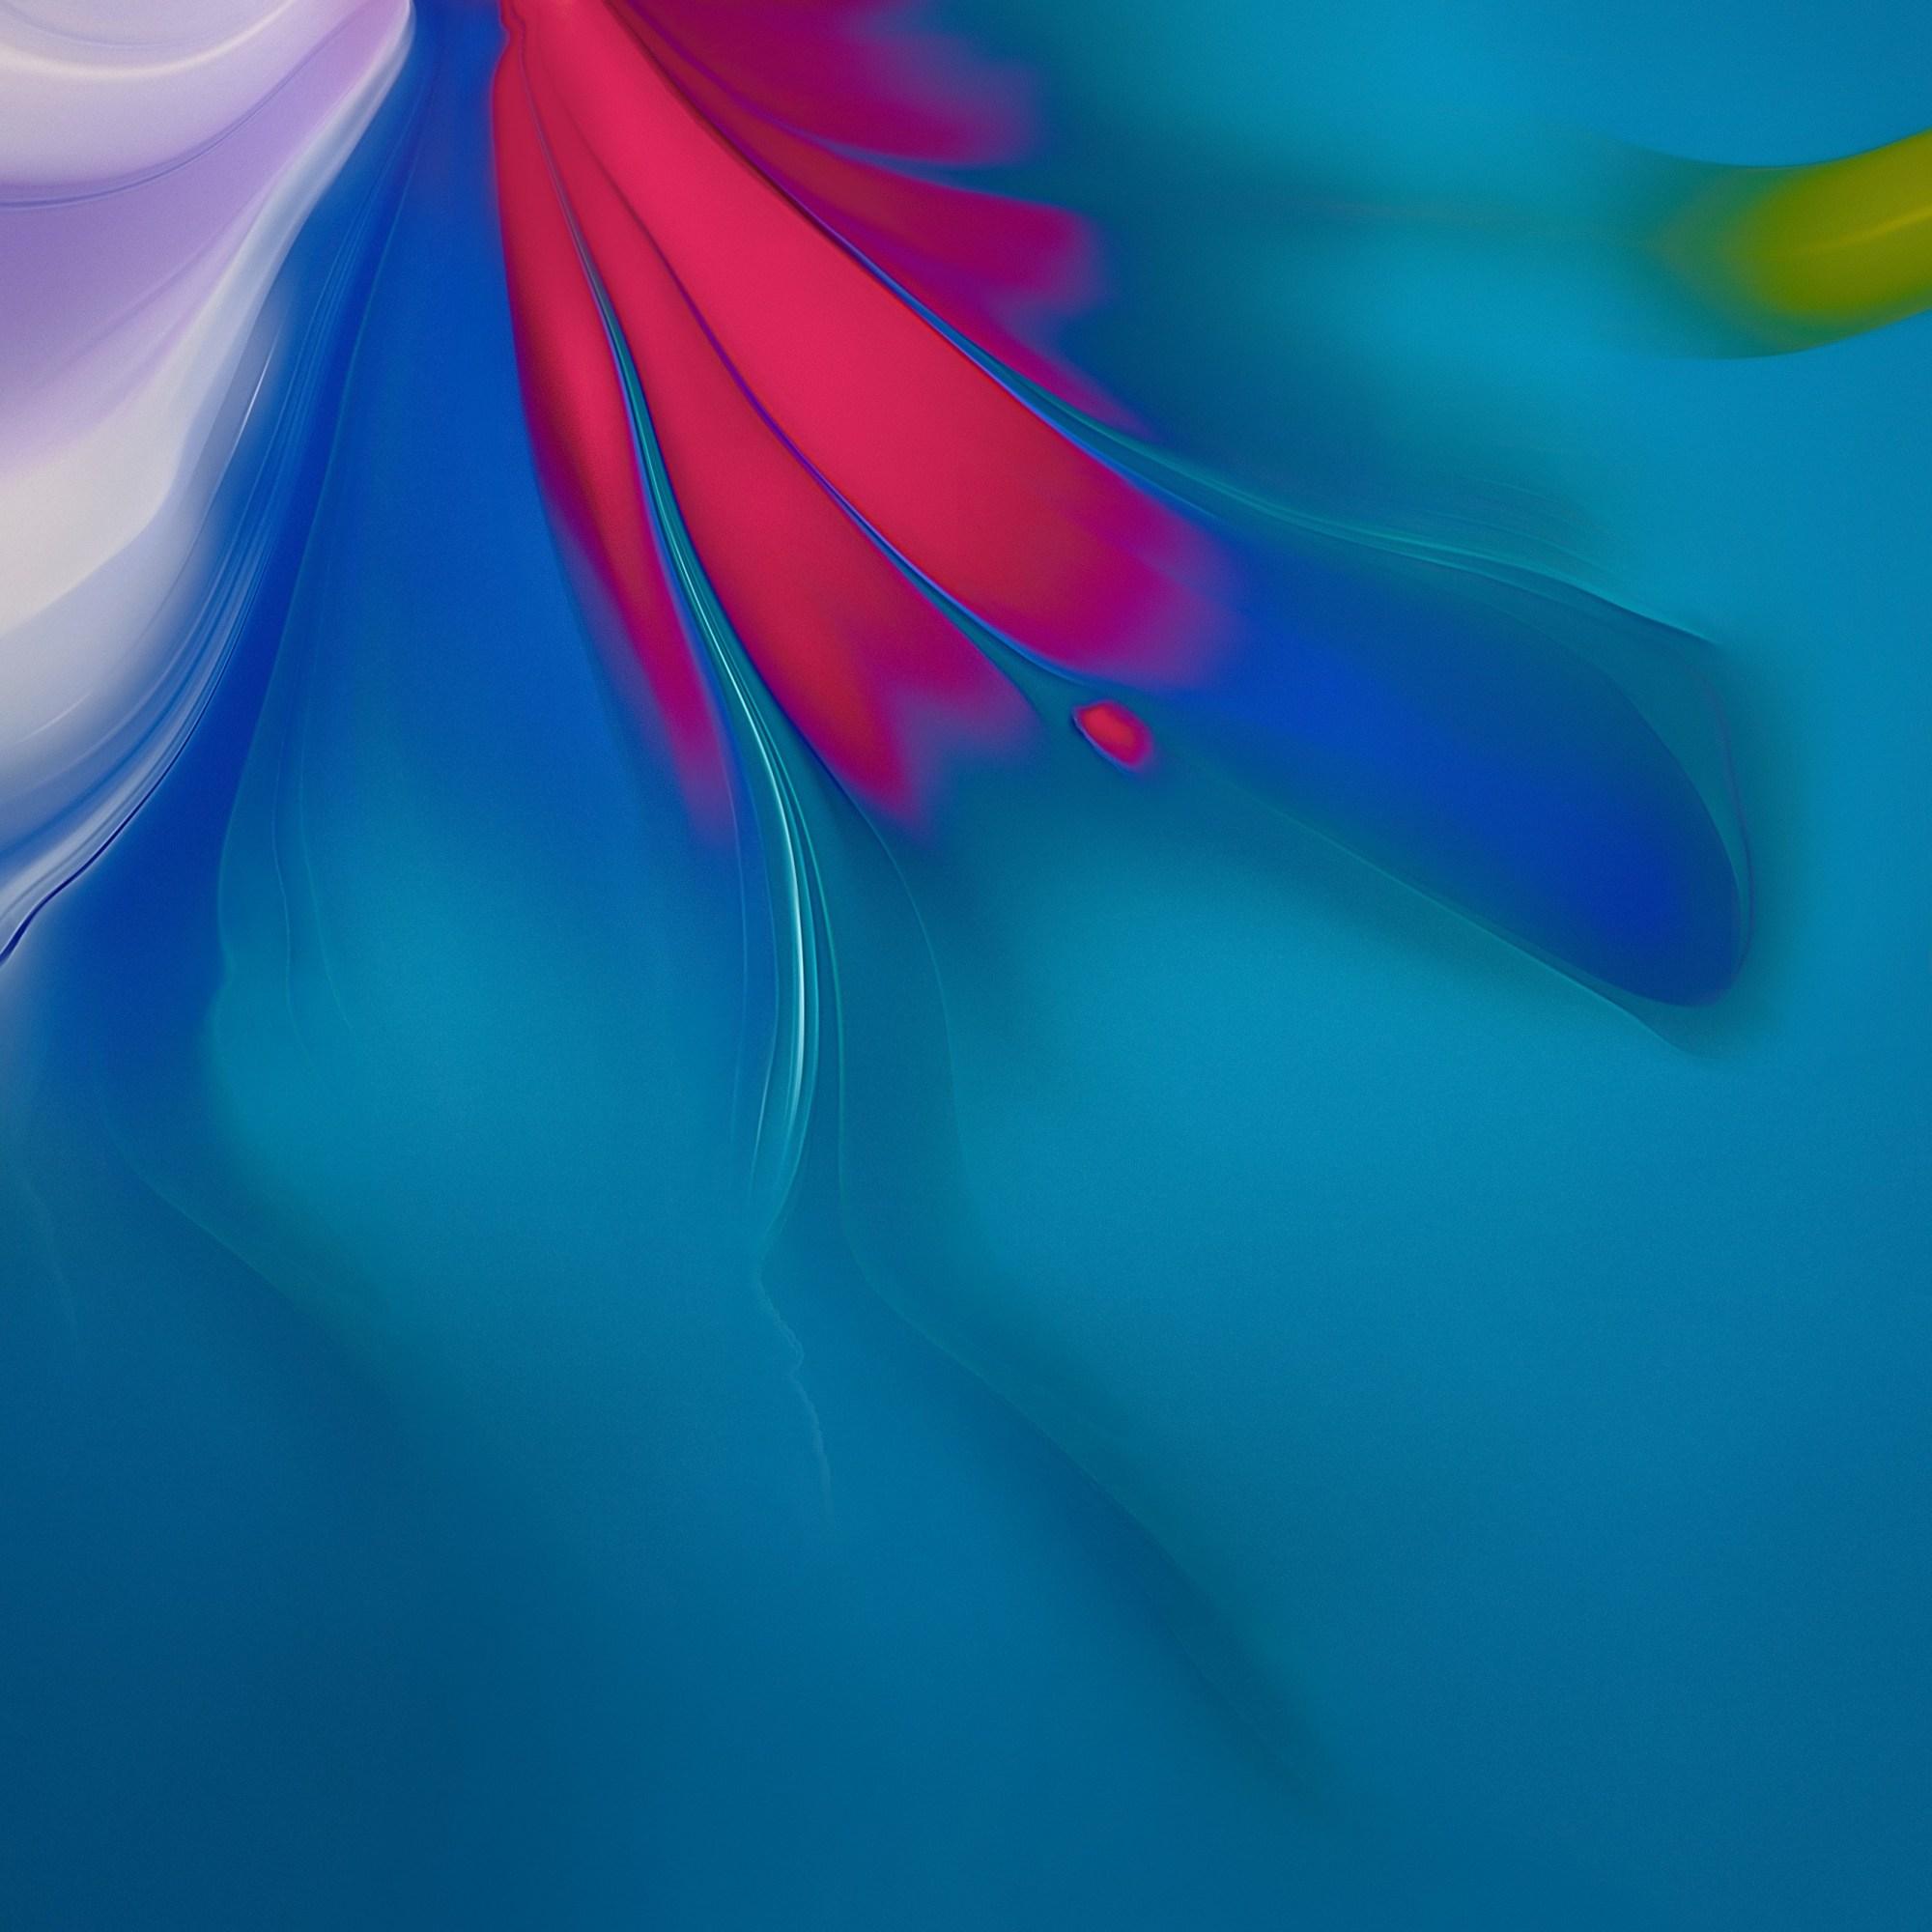 Huawei P40 Pro wallpapers